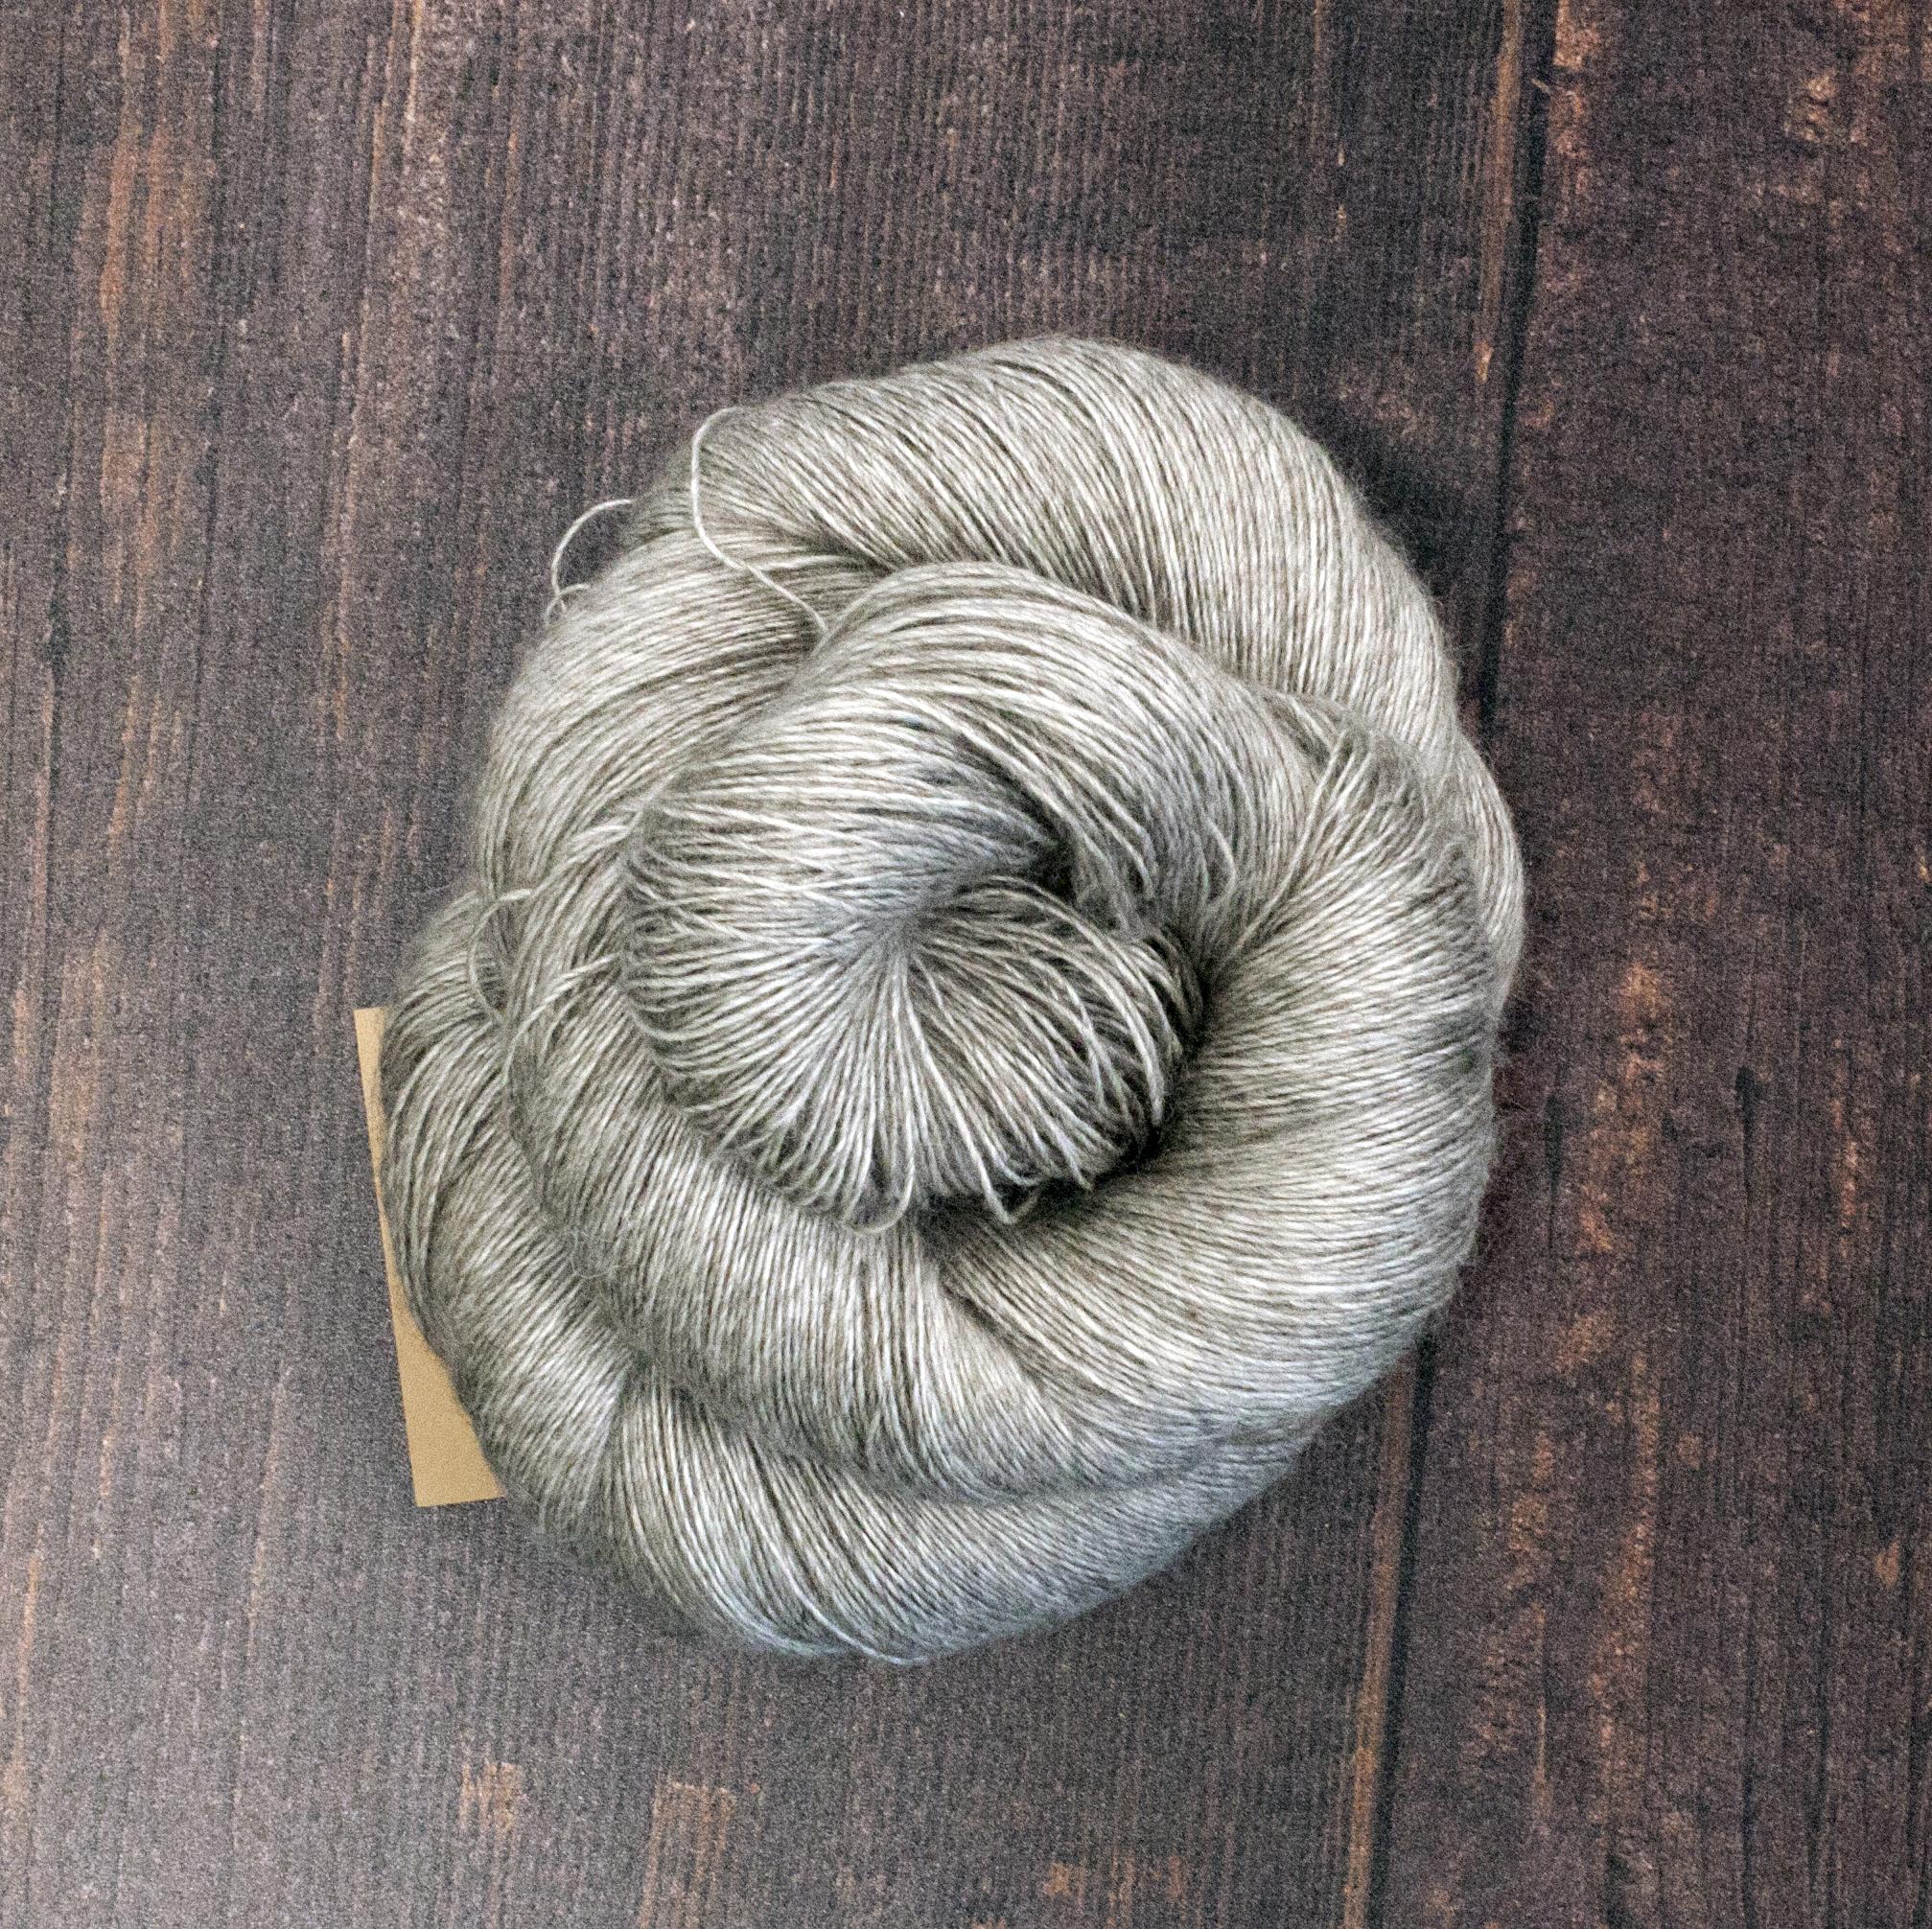 Type 49045  Yak Singles Lace  65% Superwash Merino Wool 20% Silk  15% Yak Singles  100g Hanks 800m per 100g 1/8nm